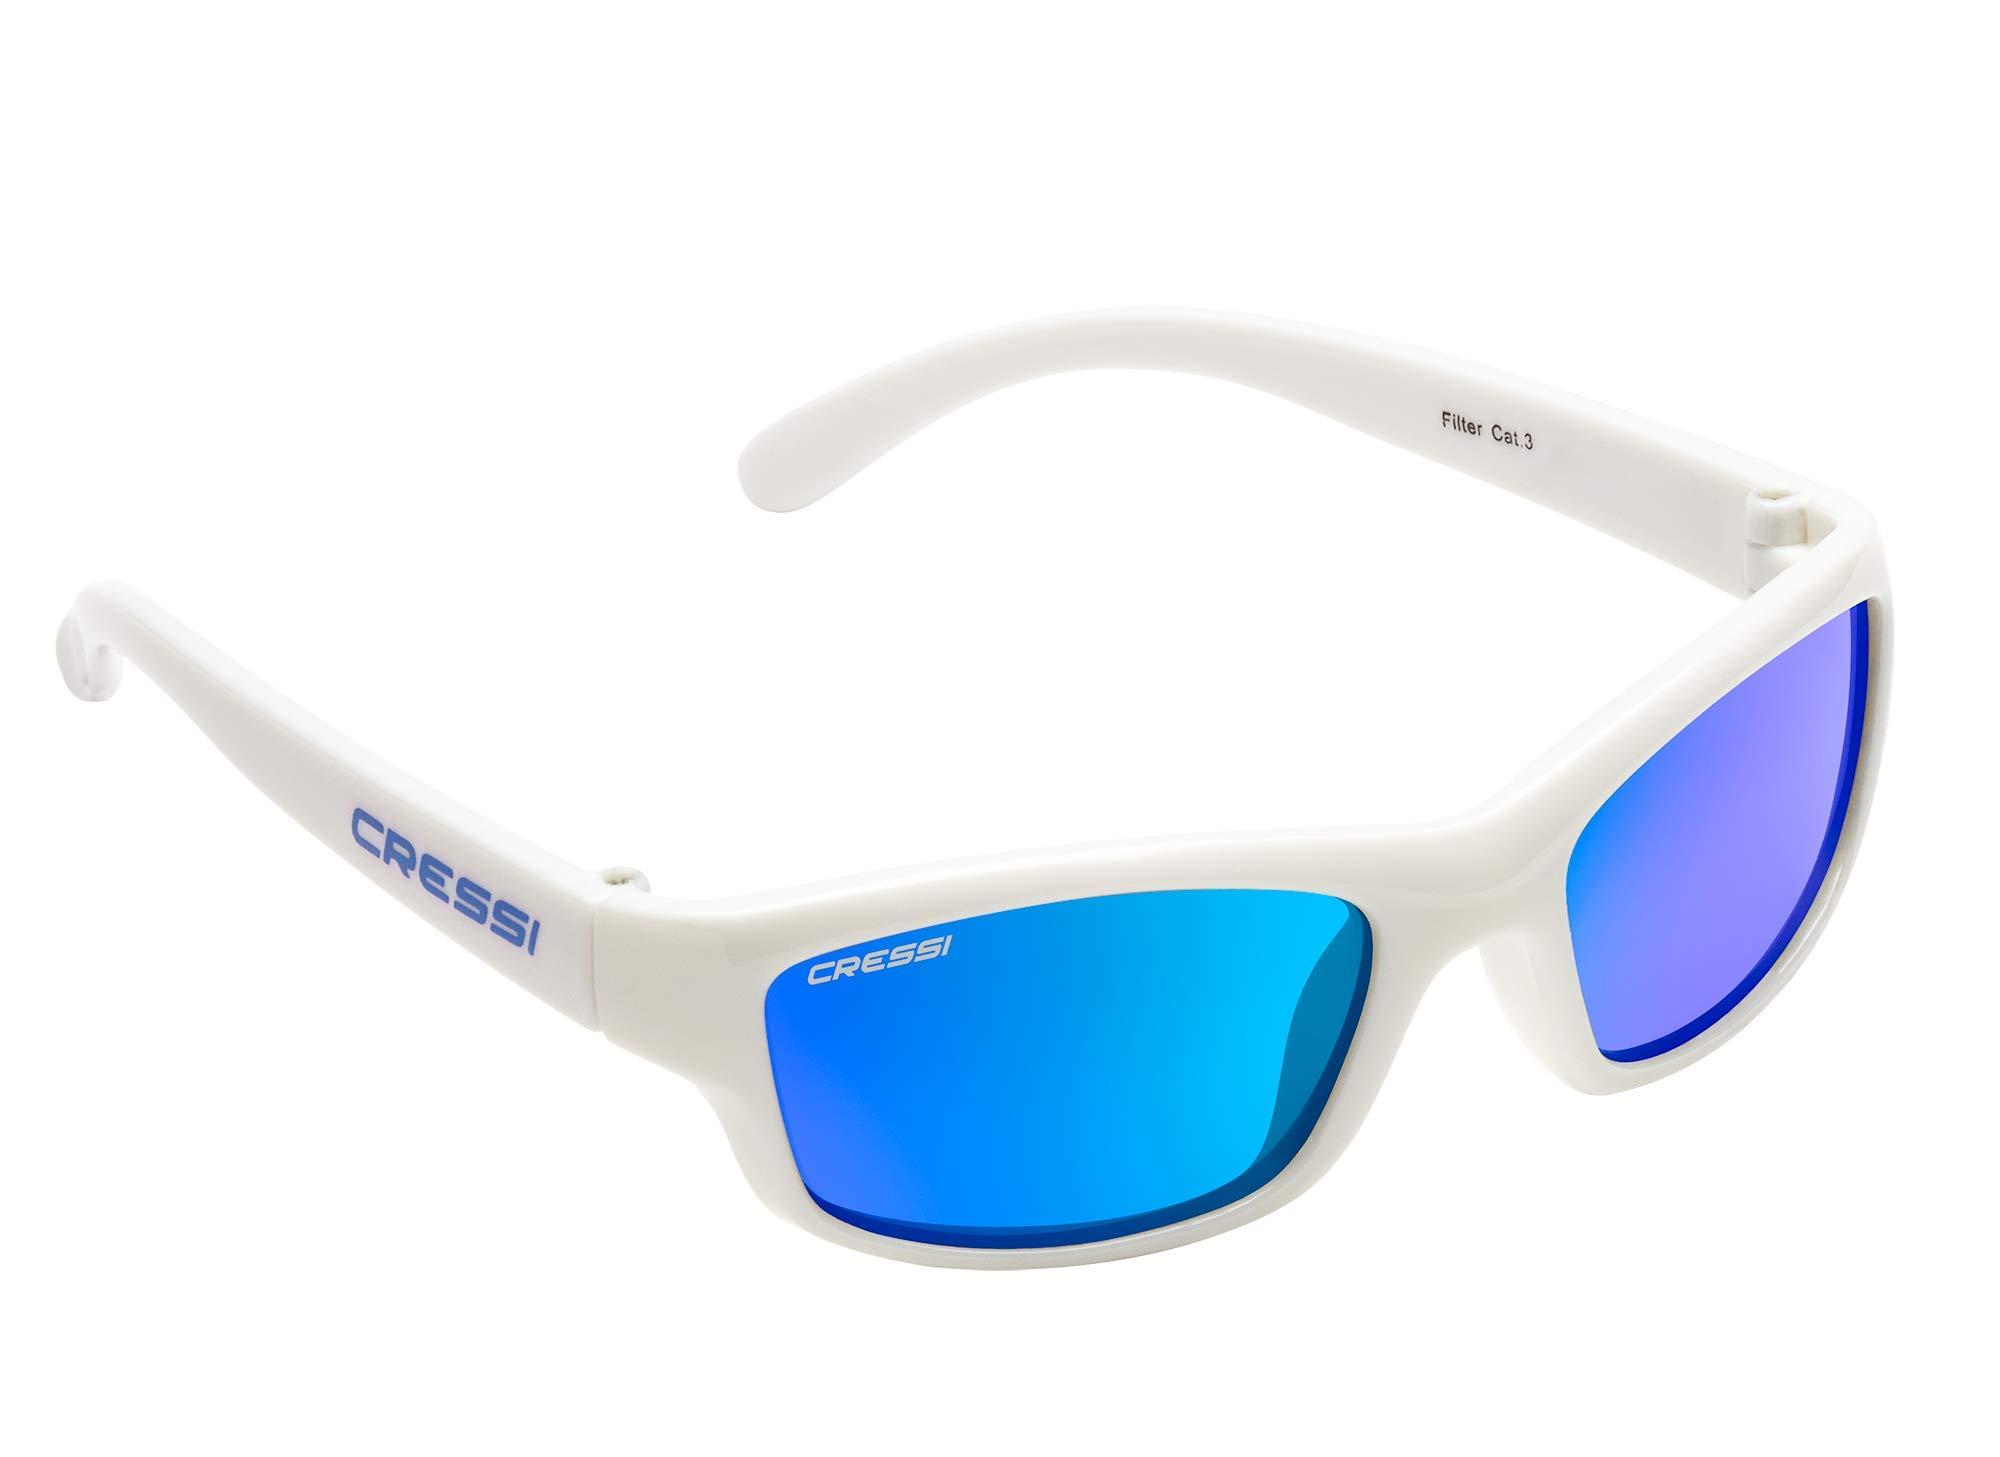 Cressi Kids Cool Sporty Sunglasses Anti-UV Polarized Lenses for 2 to 15 Years Old | Maka & Yogi